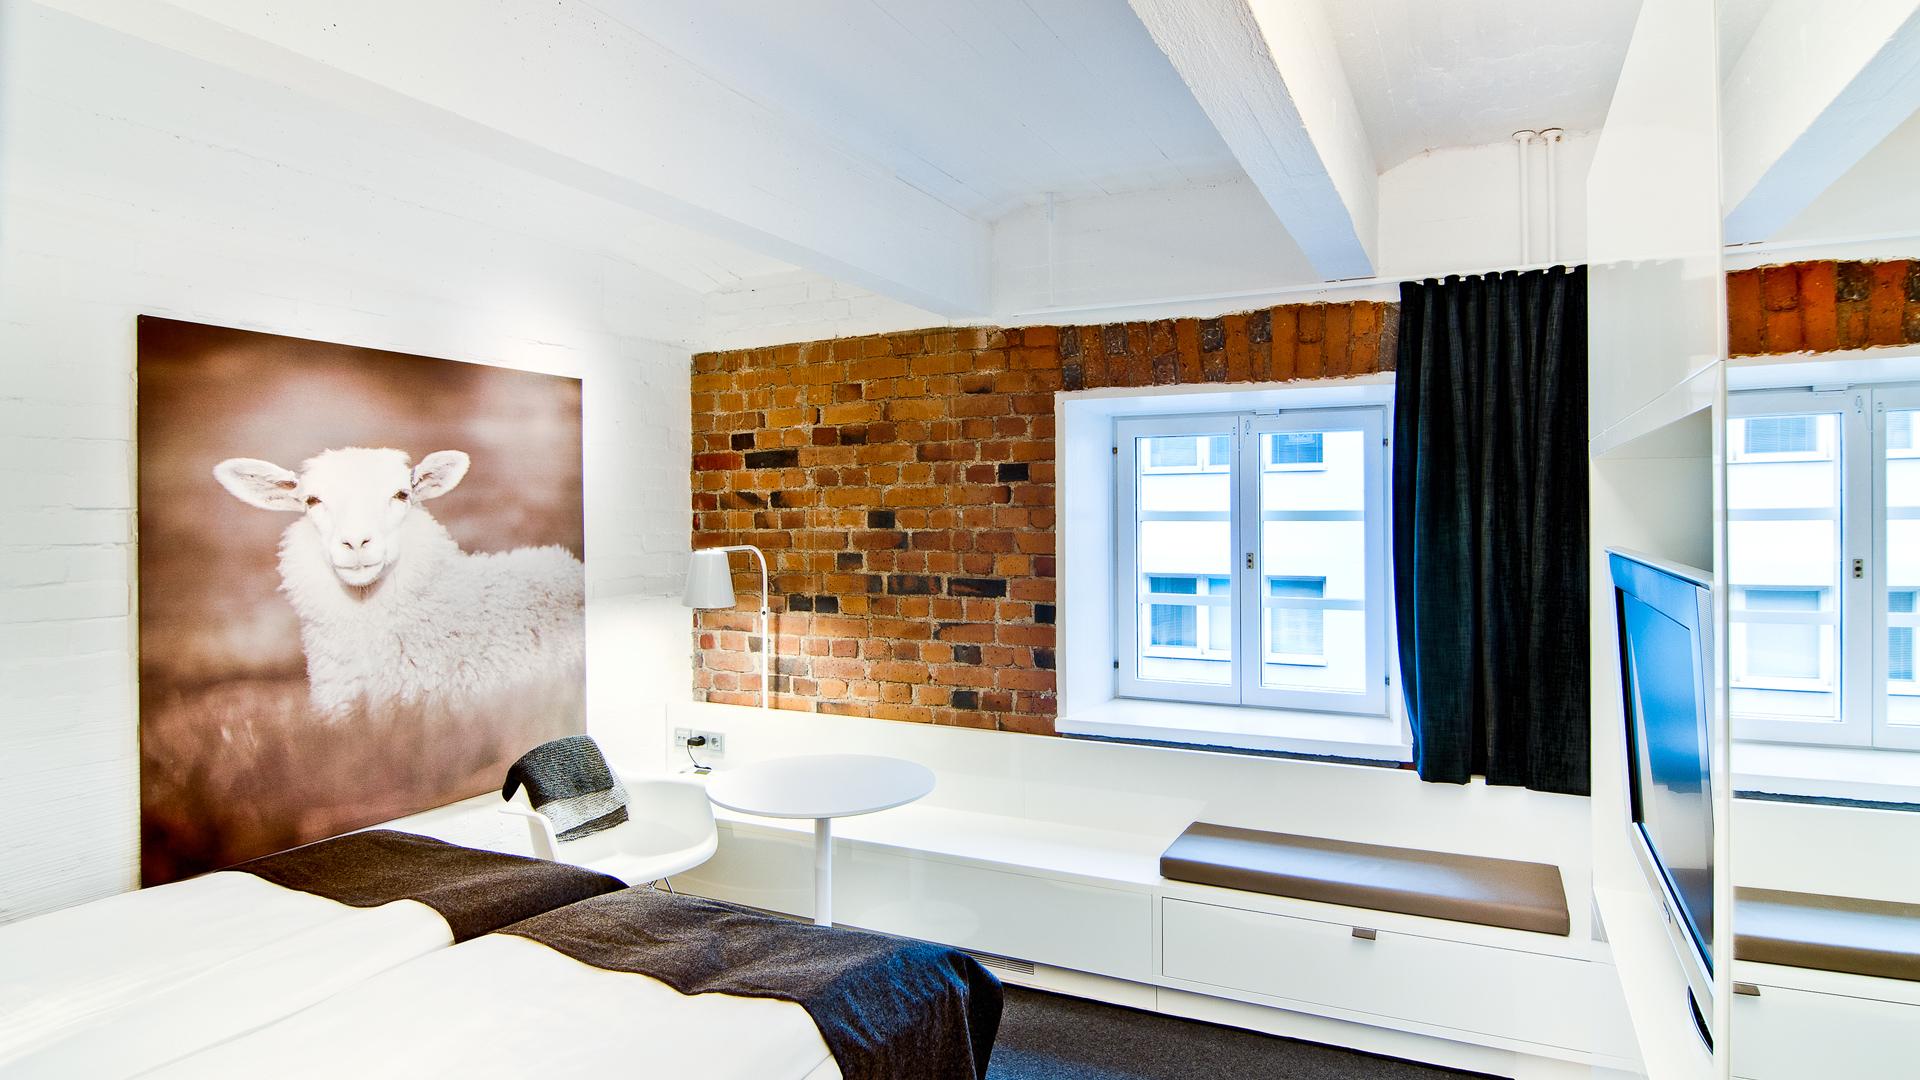 Sokos_Hotel_Villa_Tampere_GI_home_page